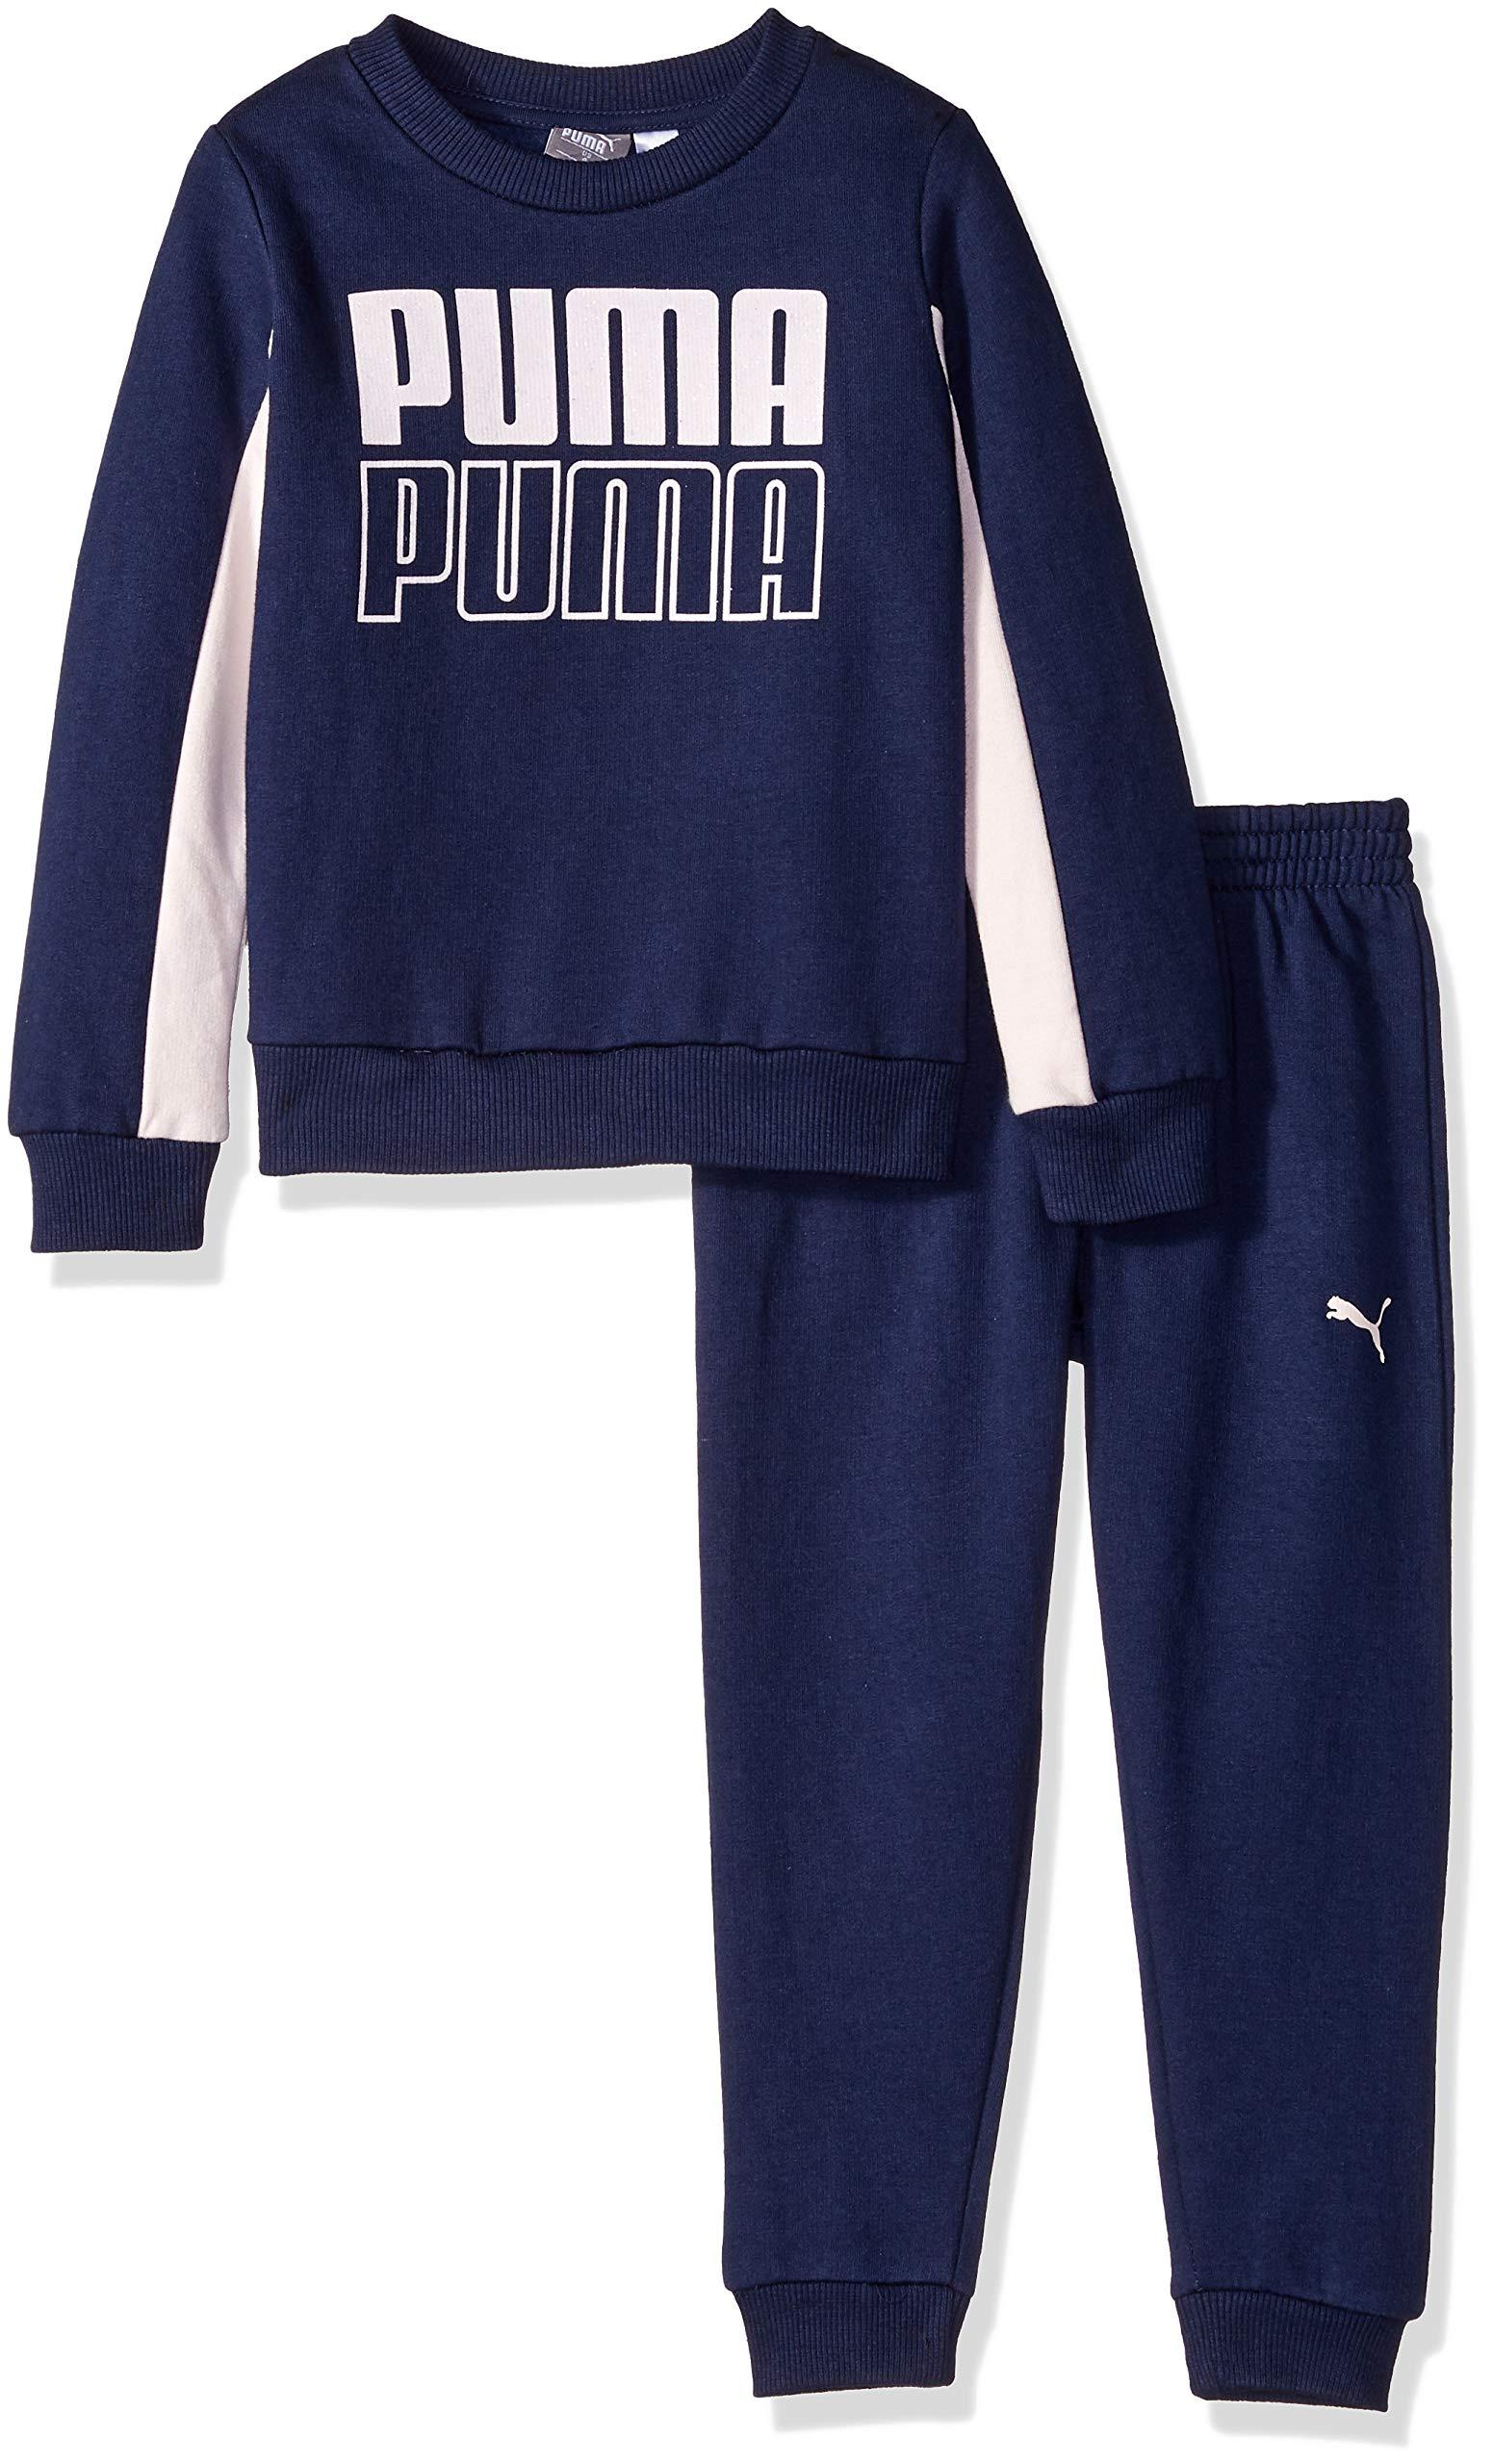 PUMA Little Girls' Pullover Fleece Set, Peacoat, 4